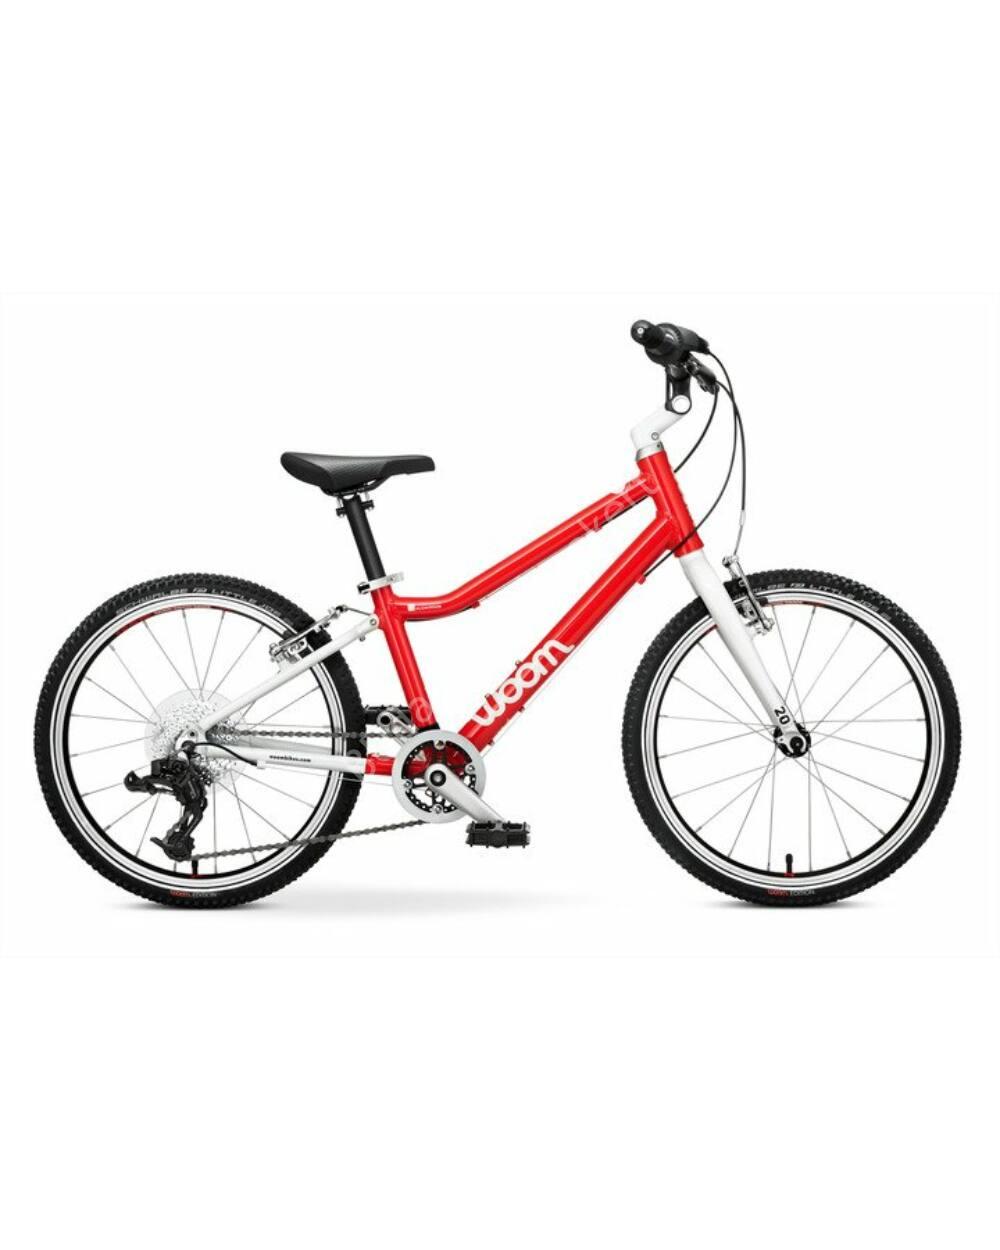 Woom 4 piros 20 gyerek kerékpár, 115-130 cm testmagasság, 7.3kg